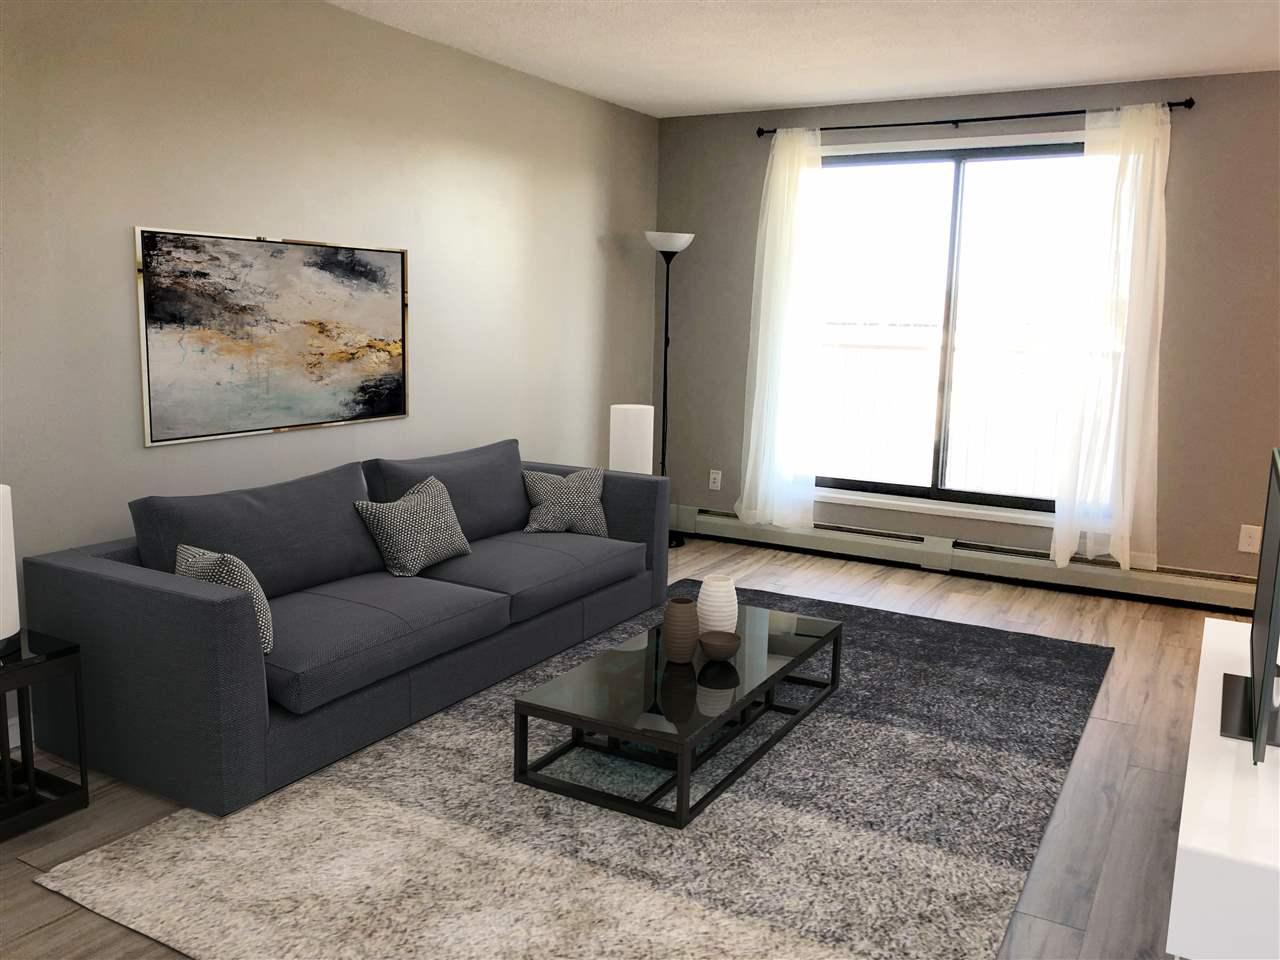 305 3611 145 Avenue, 1 bed, 1 bath, at $105,000